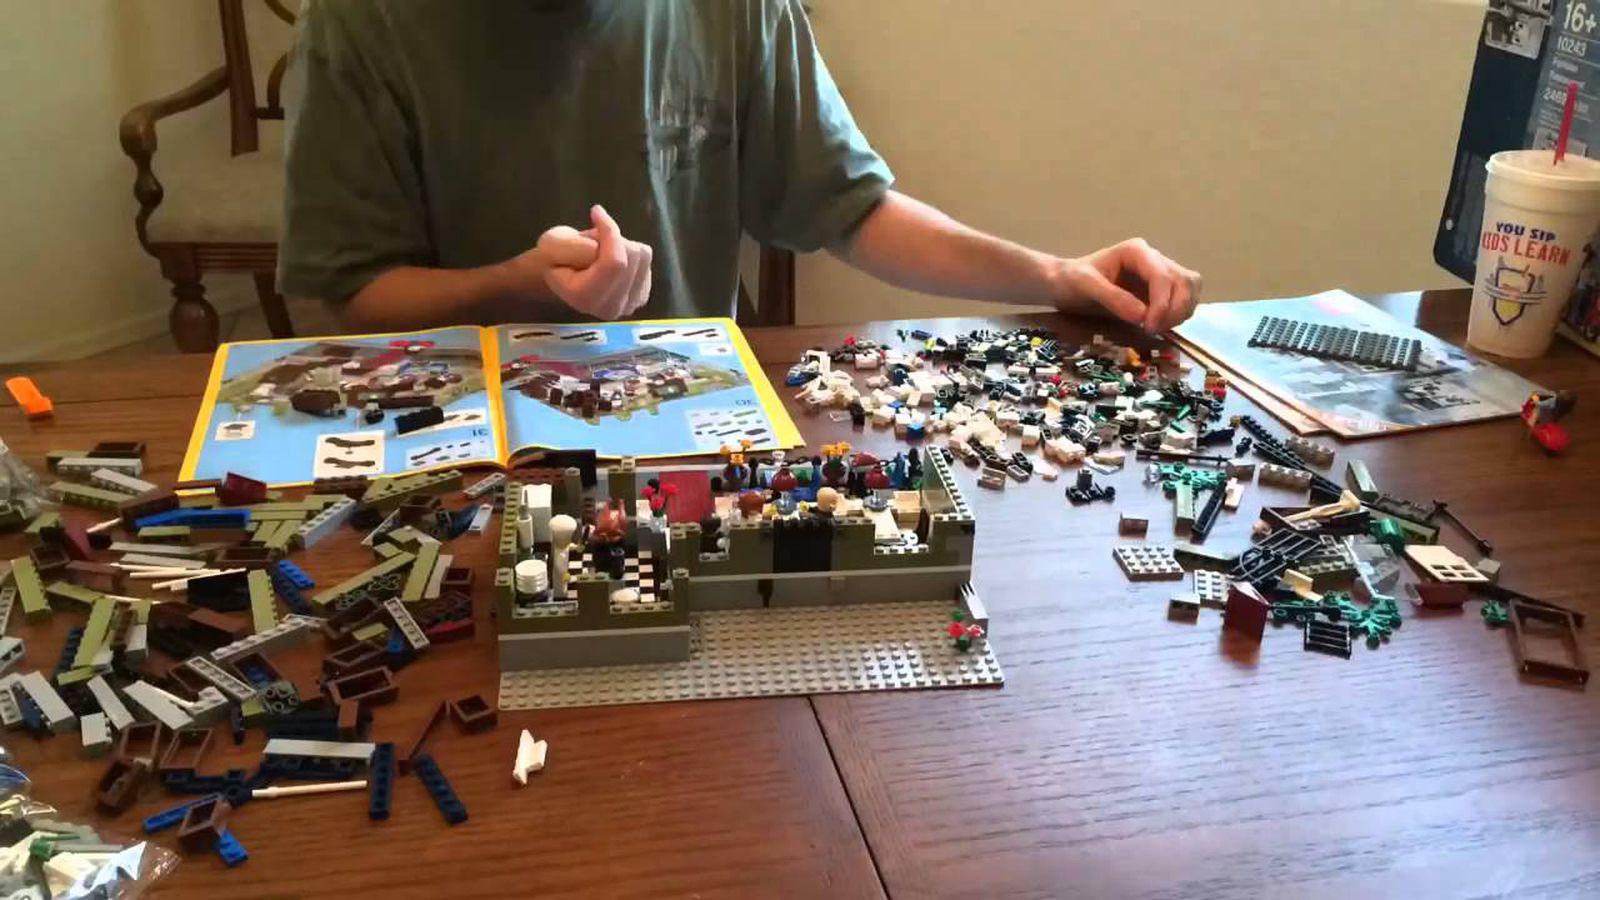 Watch Lego's 'Parisian Restaurant' Playset Built in Time-Lapse